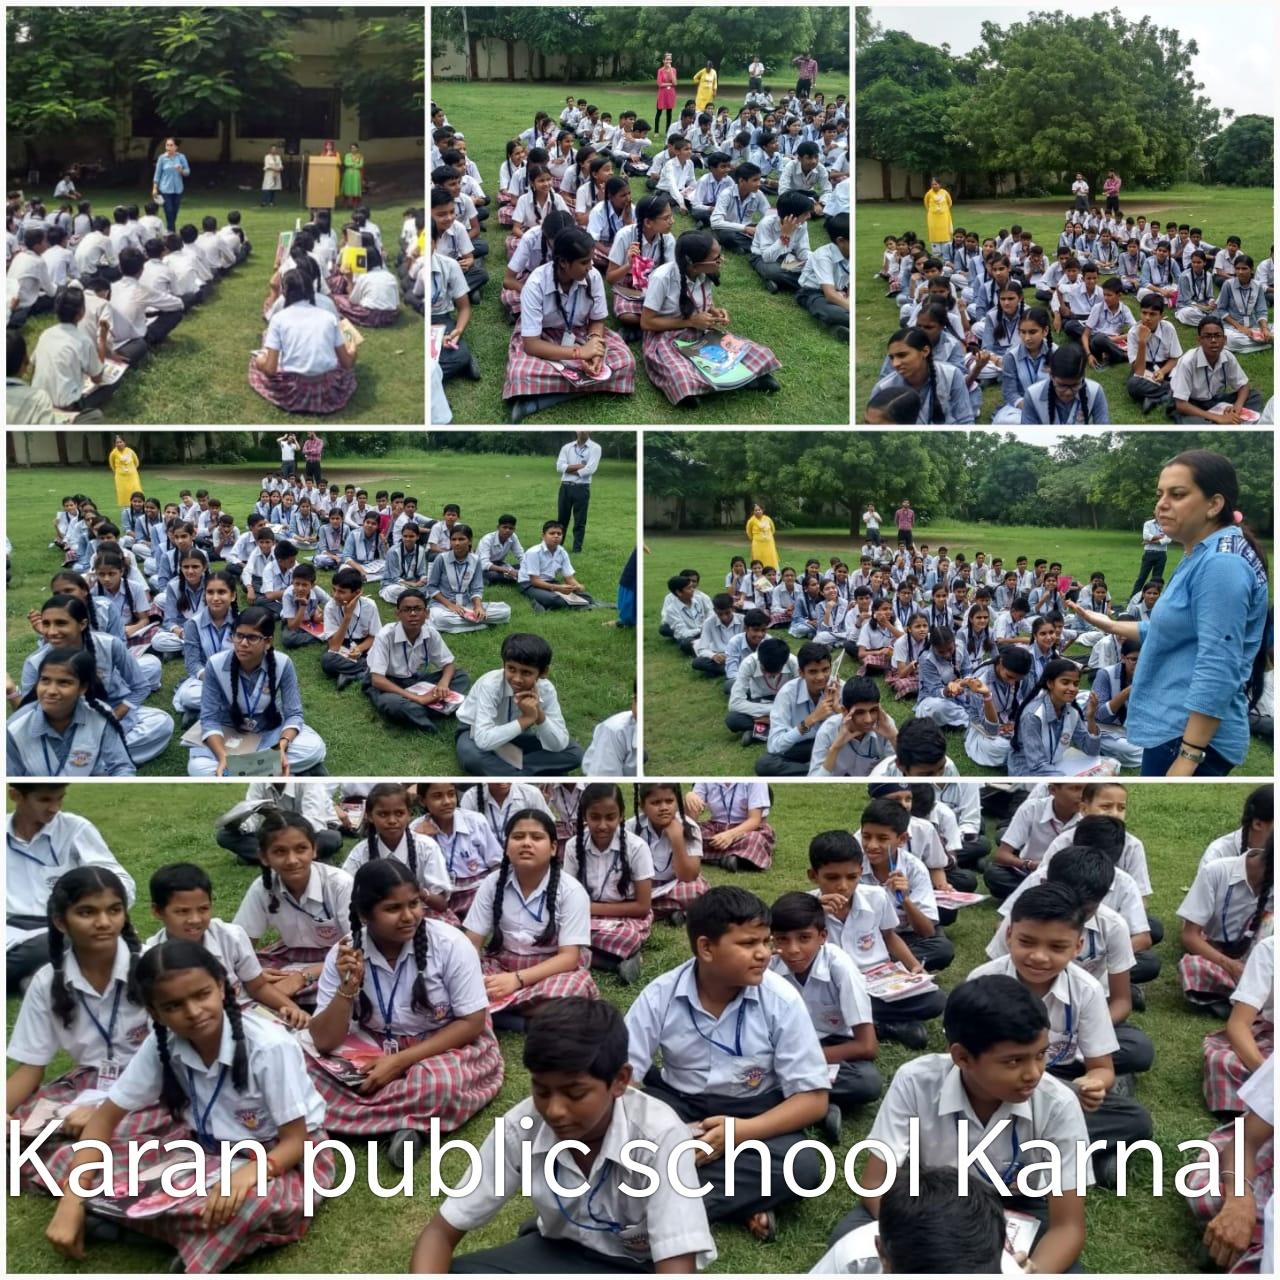 Karan Public School Karnal.jpeg